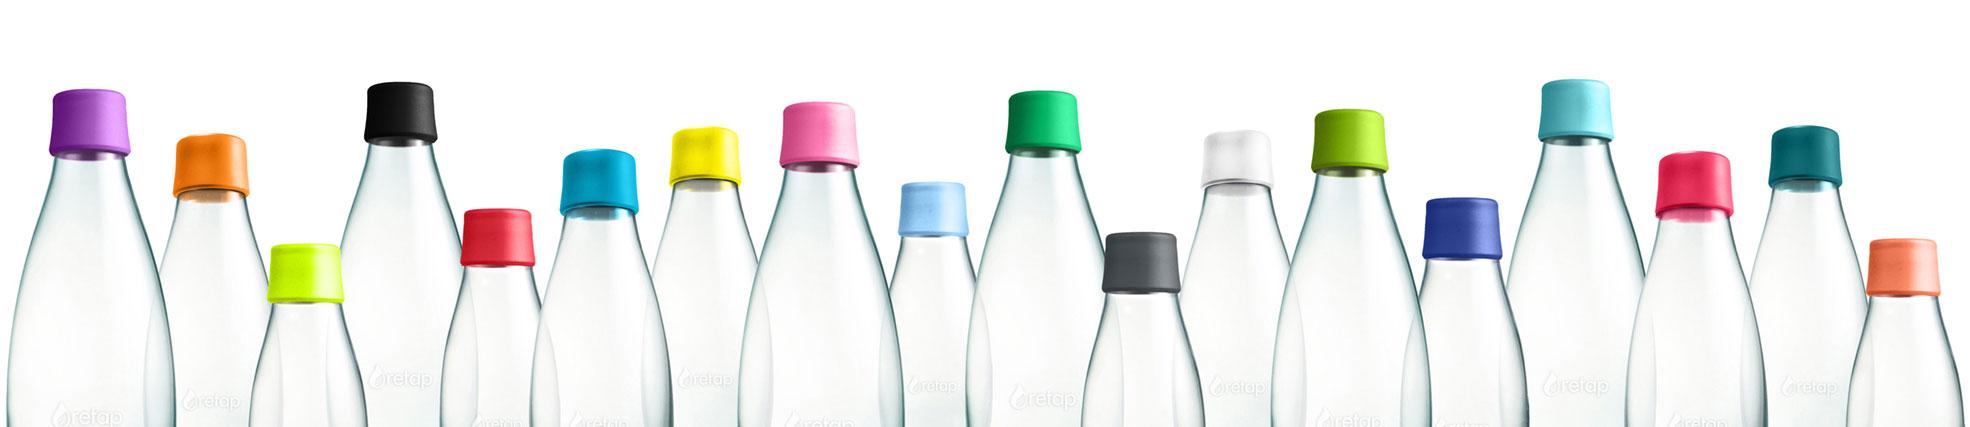 Retap vandflaske farver